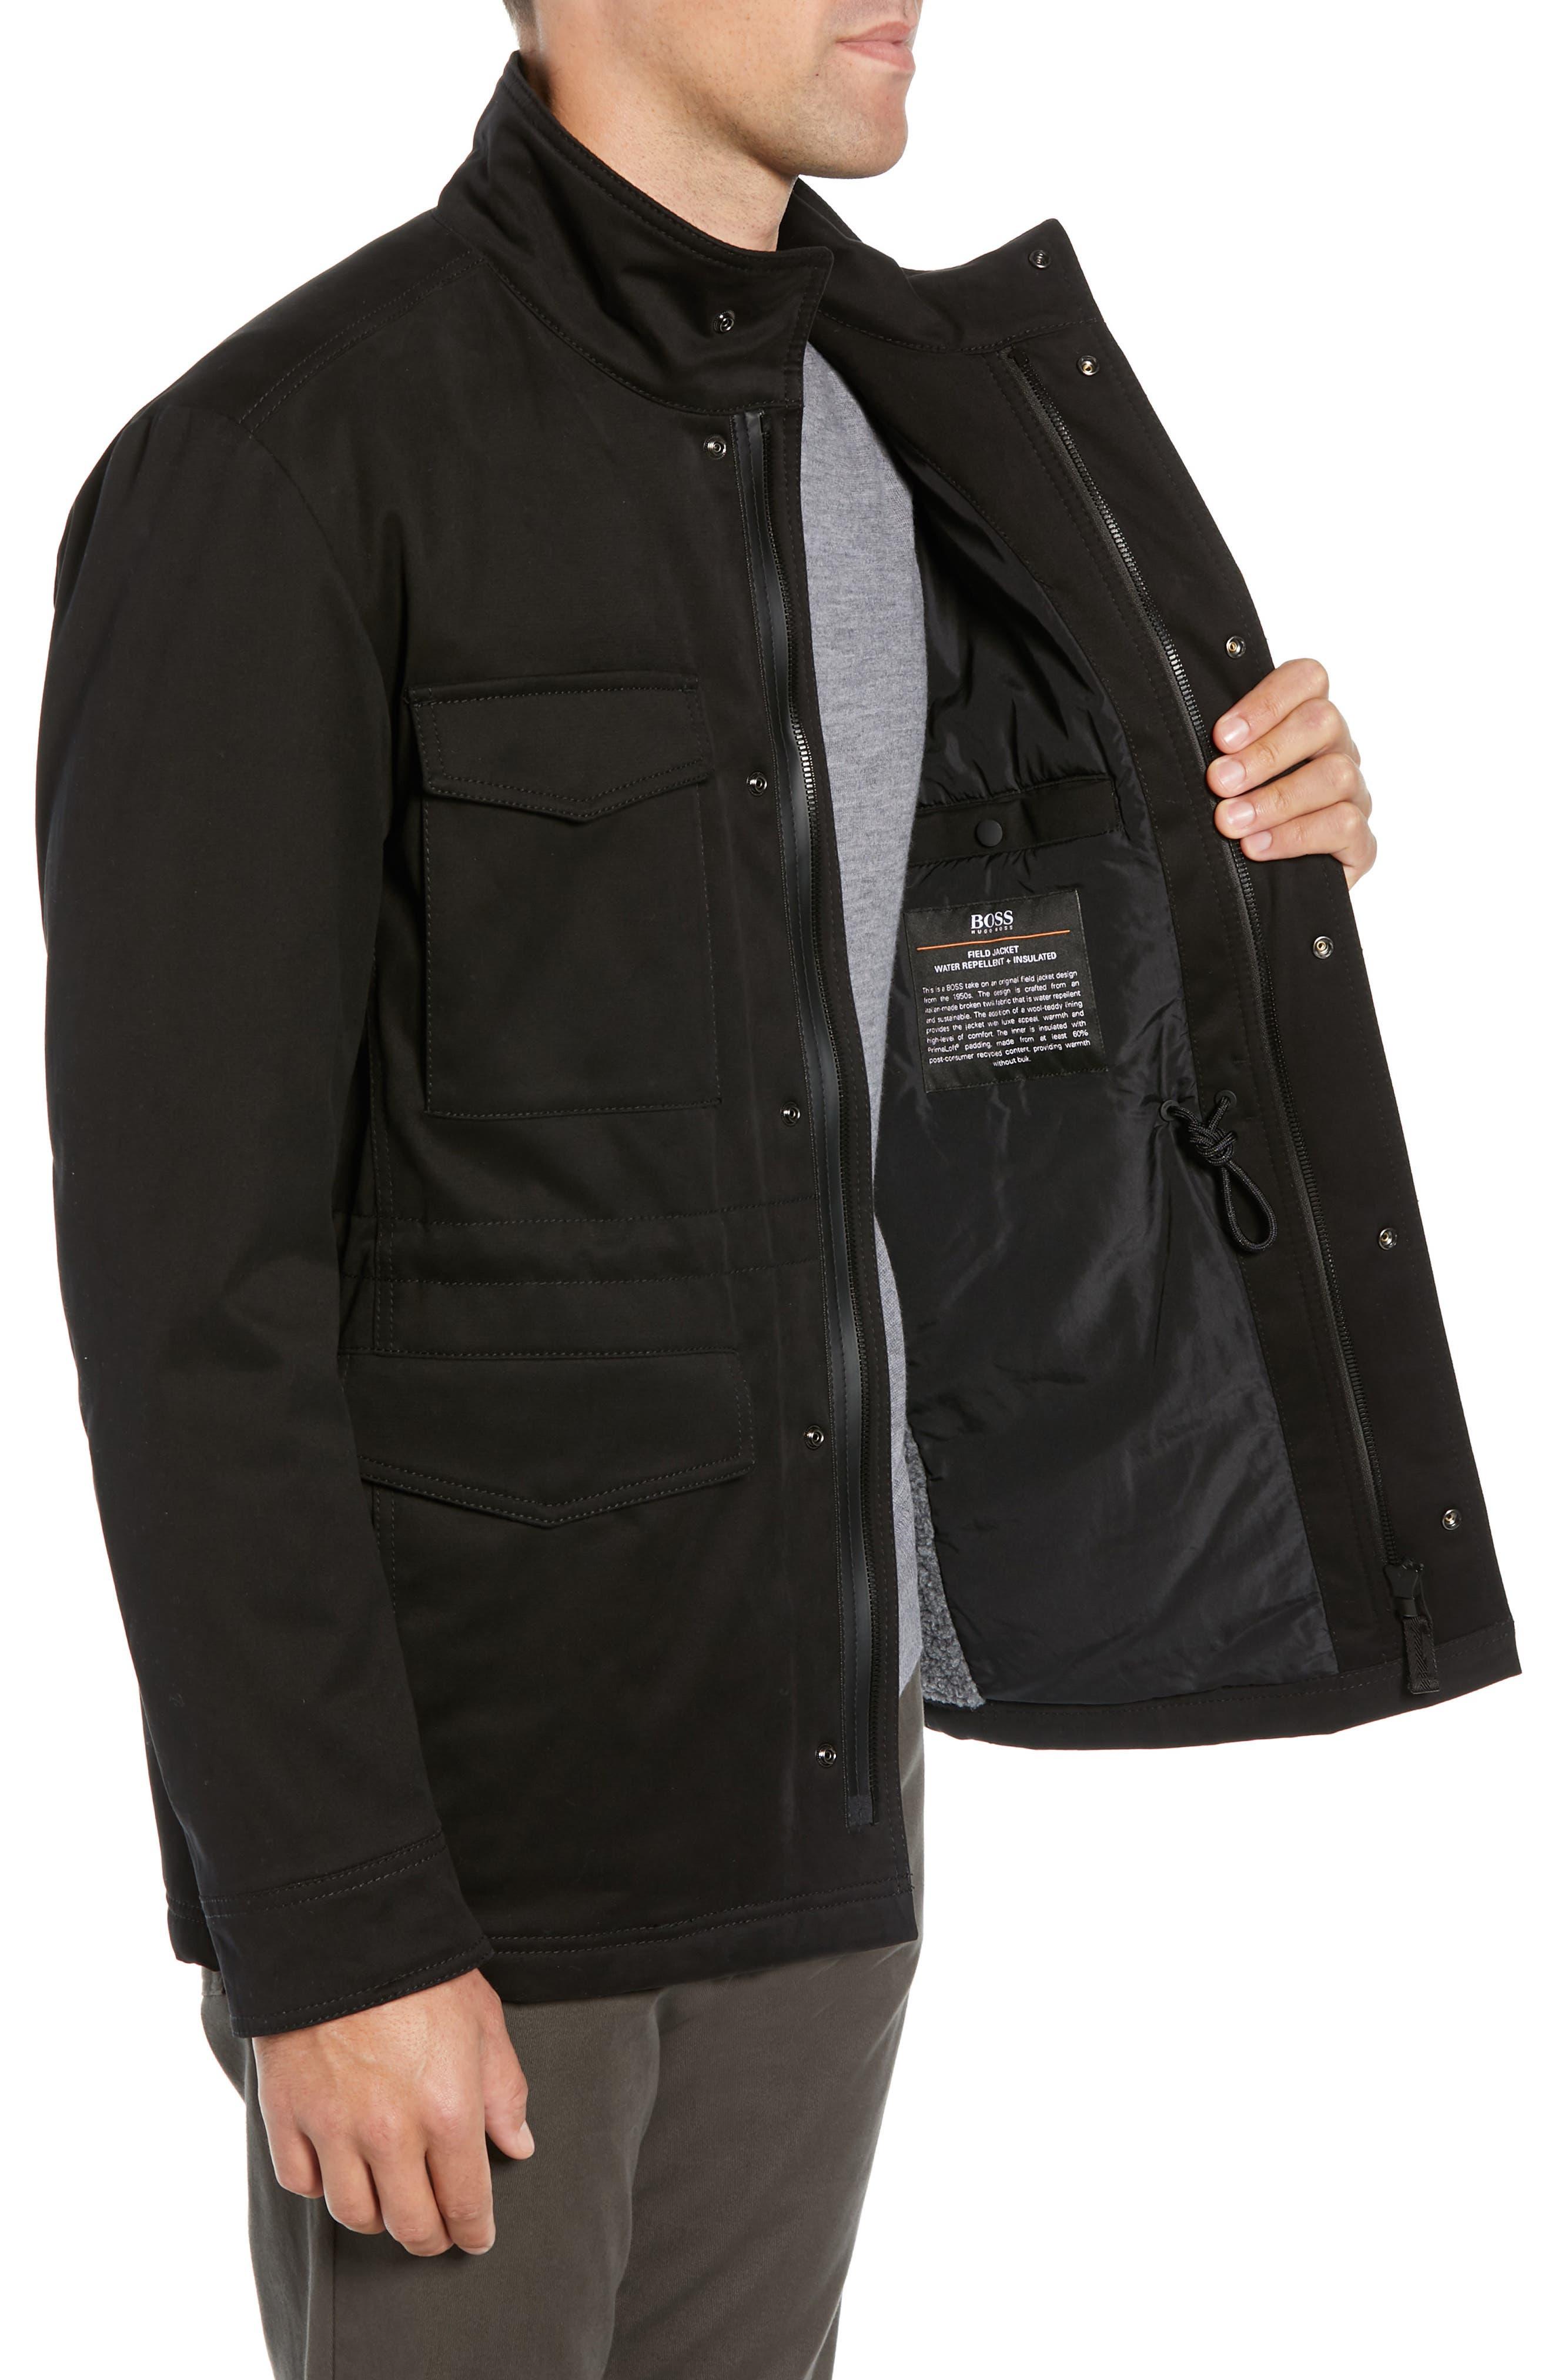 Oroy Regular Fit Field Jacket,                             Alternate thumbnail 3, color,                             BLACK